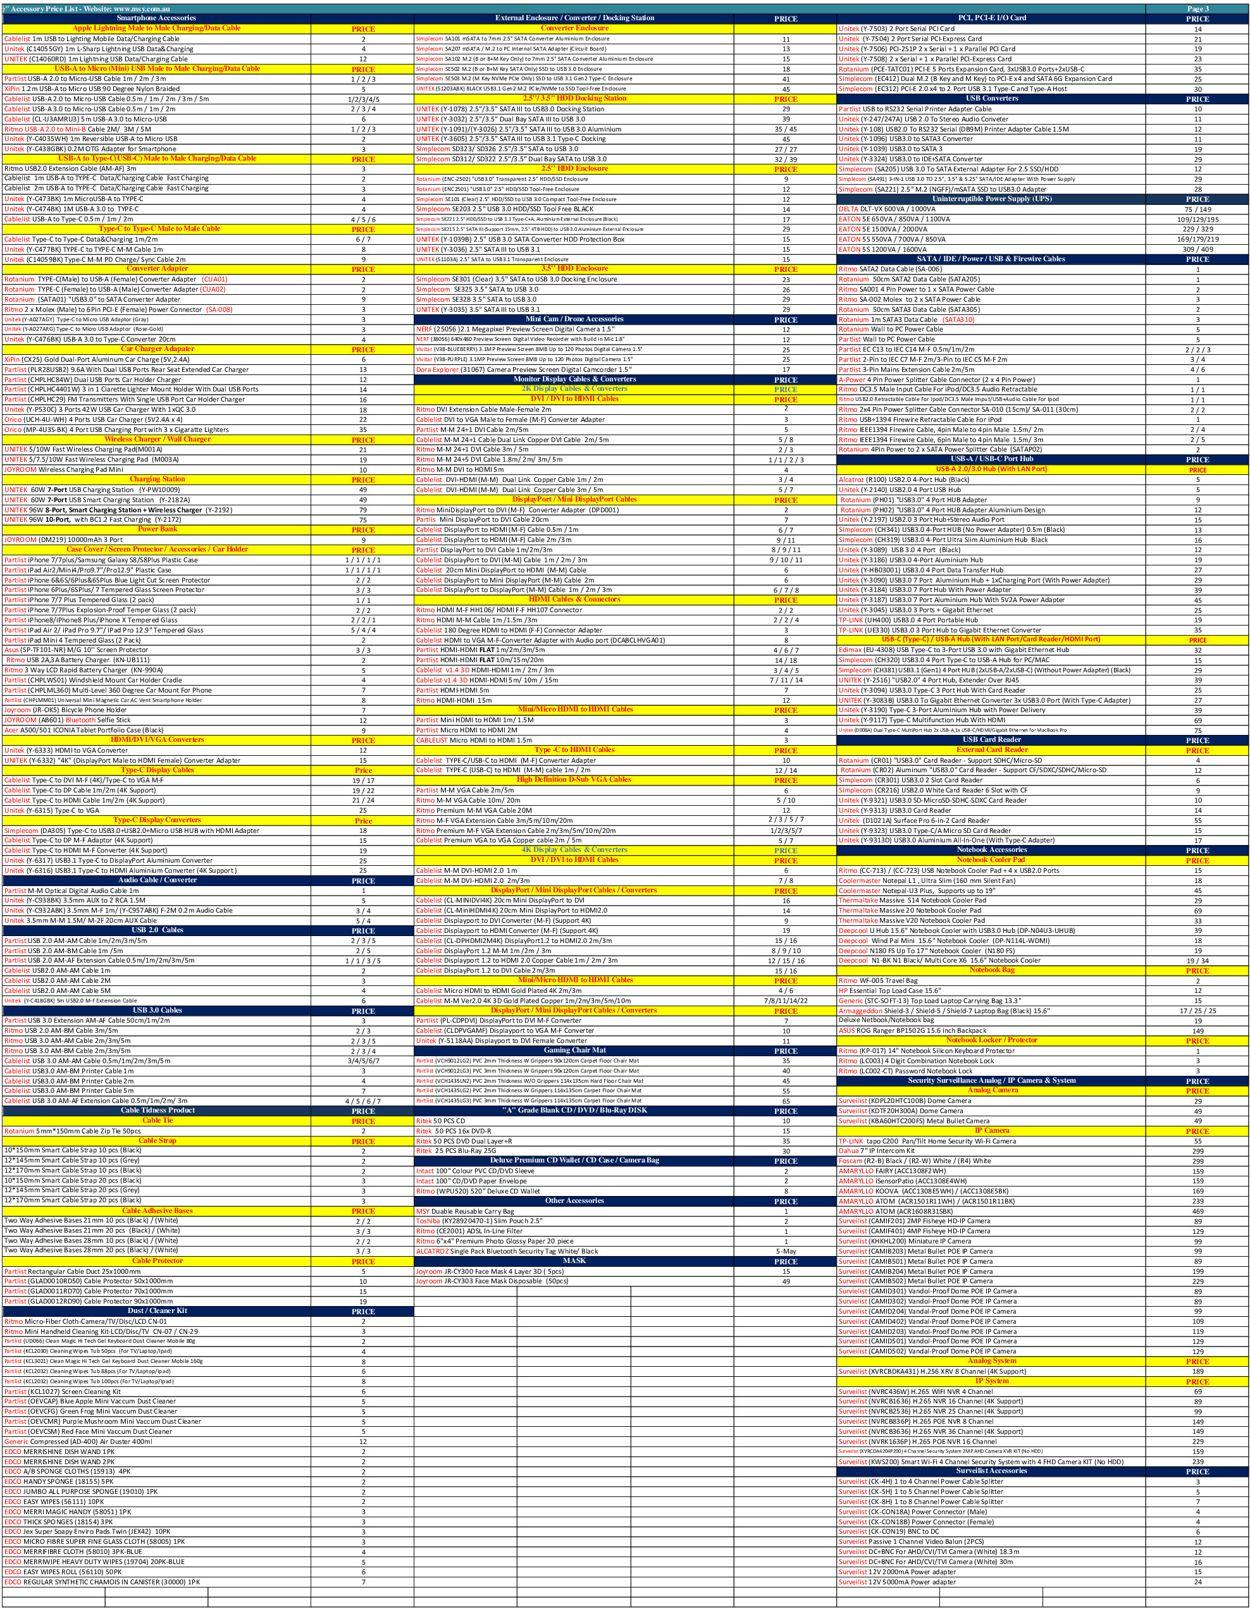 MSY Technology Catalogue - 12/01-12/01/2021 (Page 3)